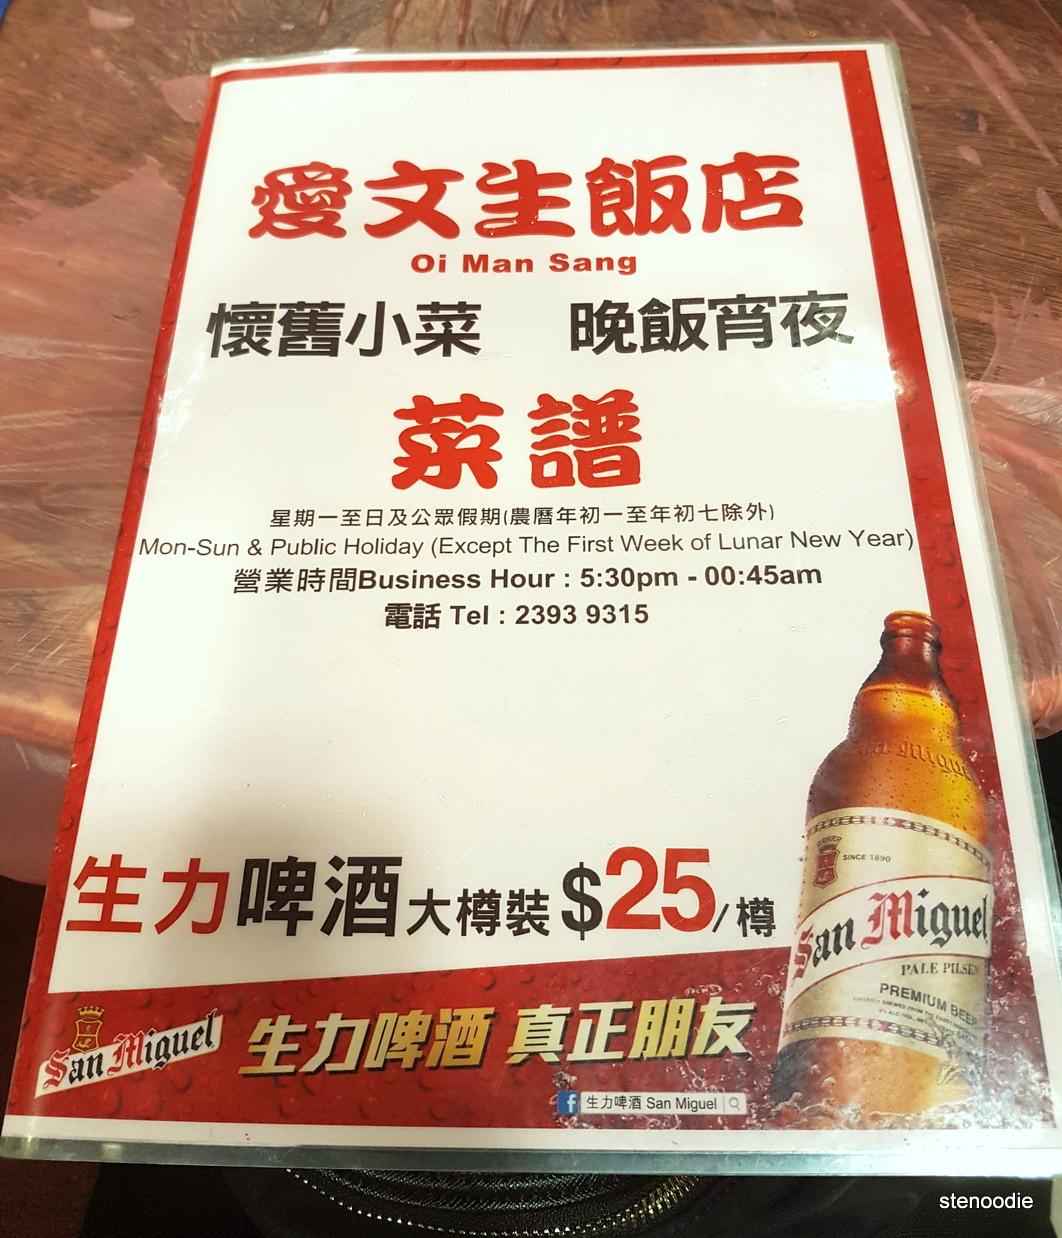 愛文生大排檔 Oi Man Sang menu cover